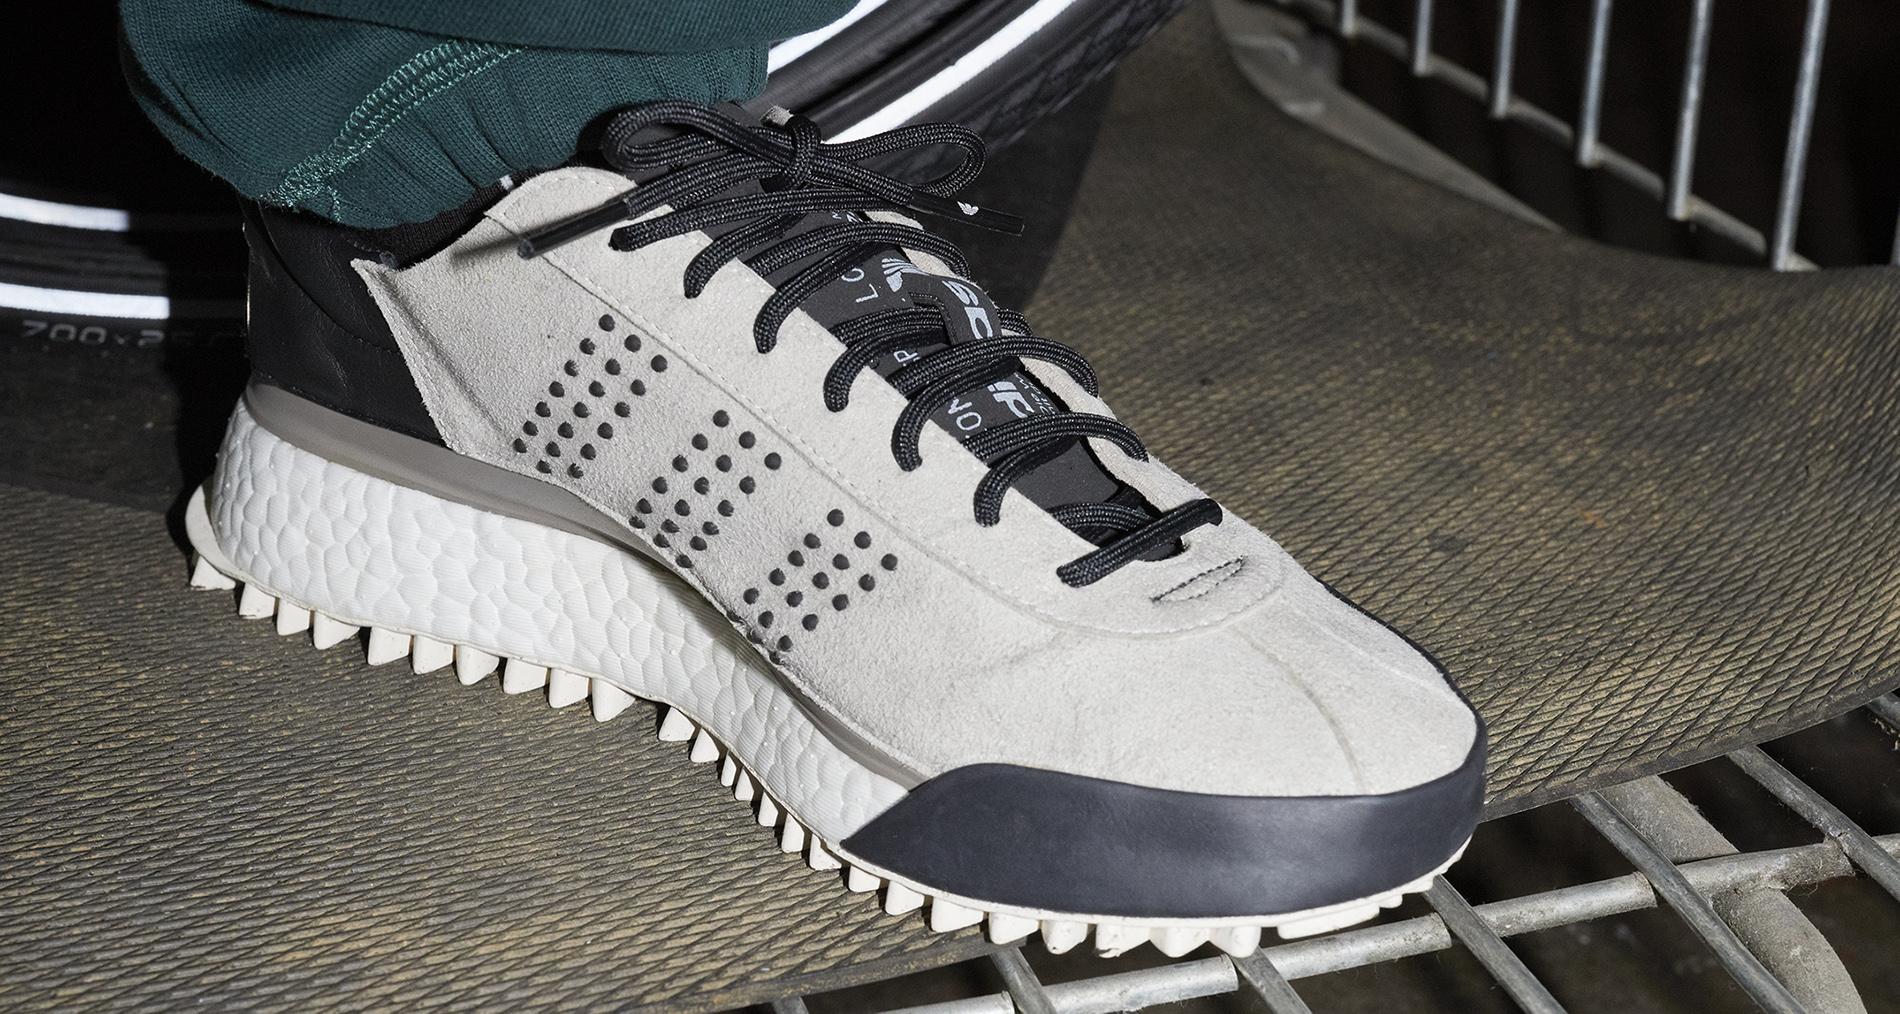 meet d4c26 48b9d Adidas Originals EQT Limited TCushion ADV function limited black and white  CP9460